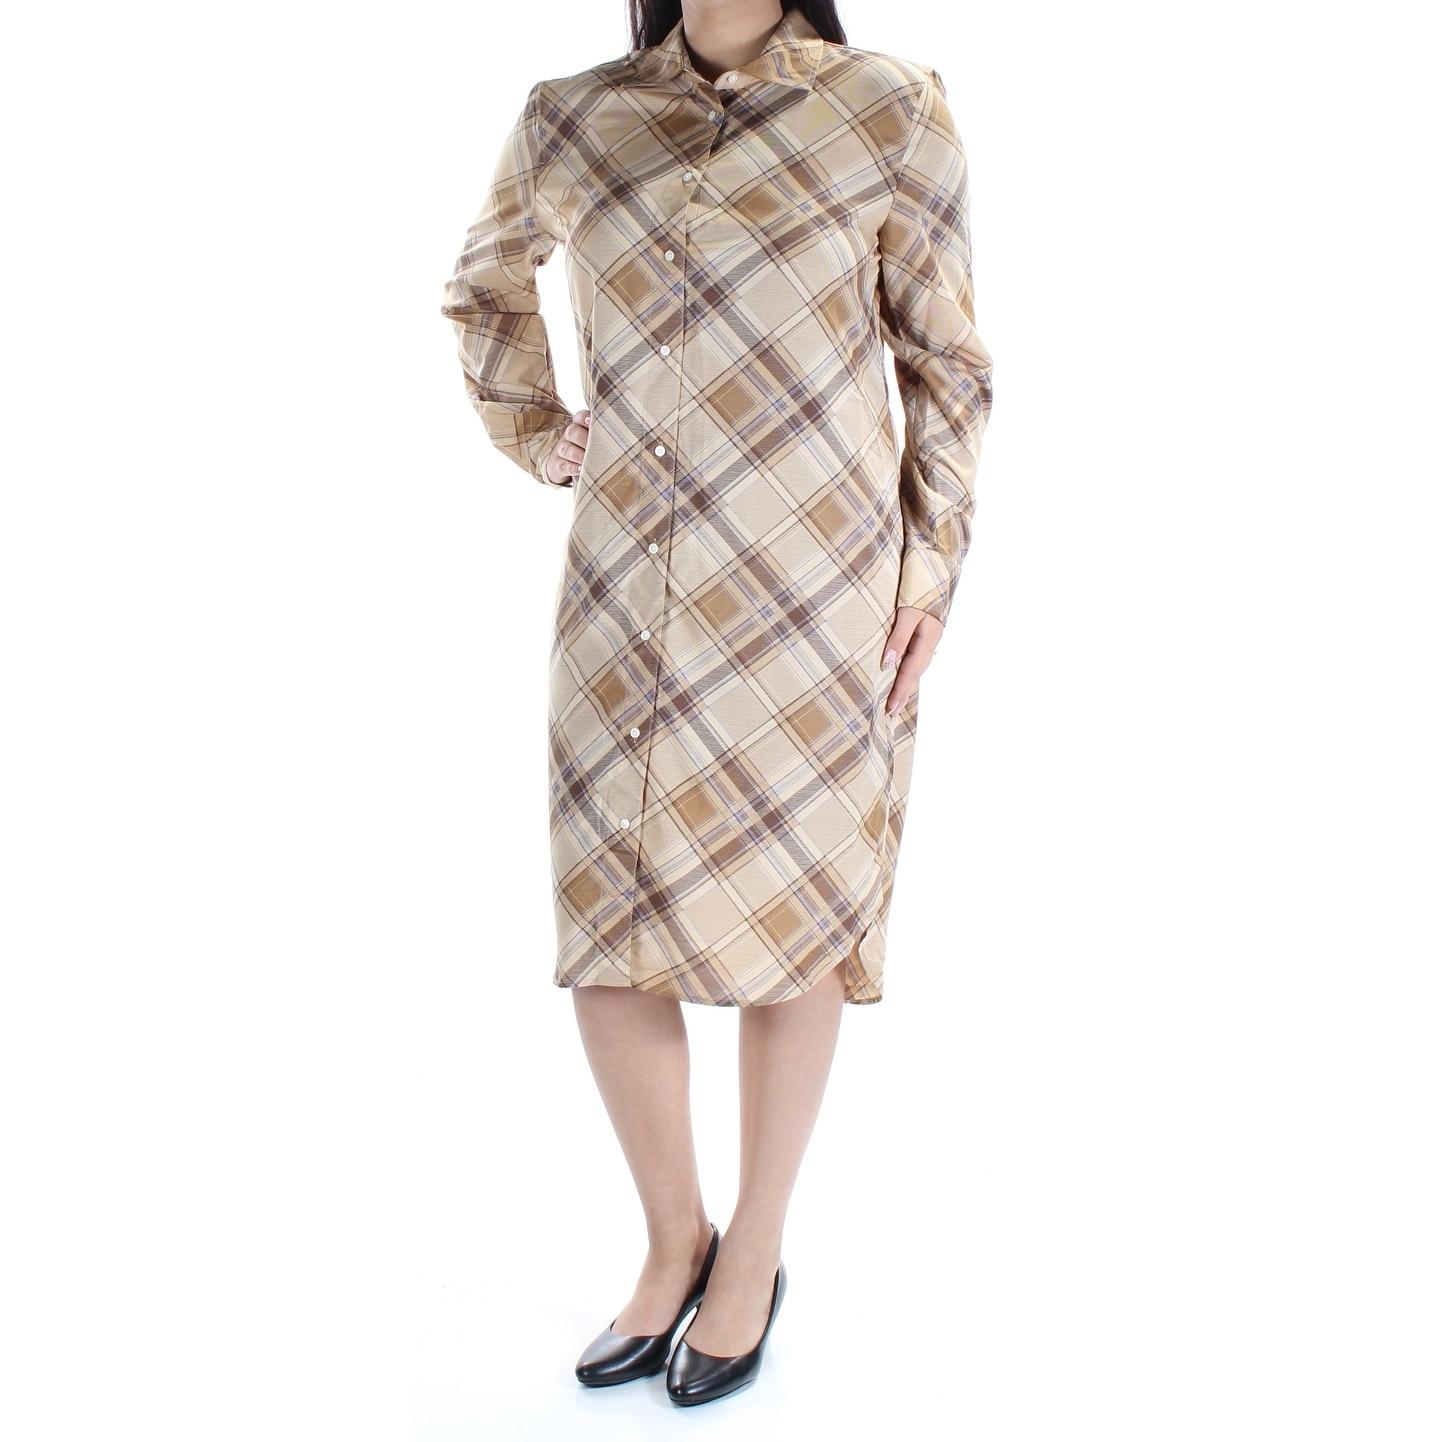 Shop Ralph Lauren Womens Beige Plaid Cuffed Collared Below The Knee